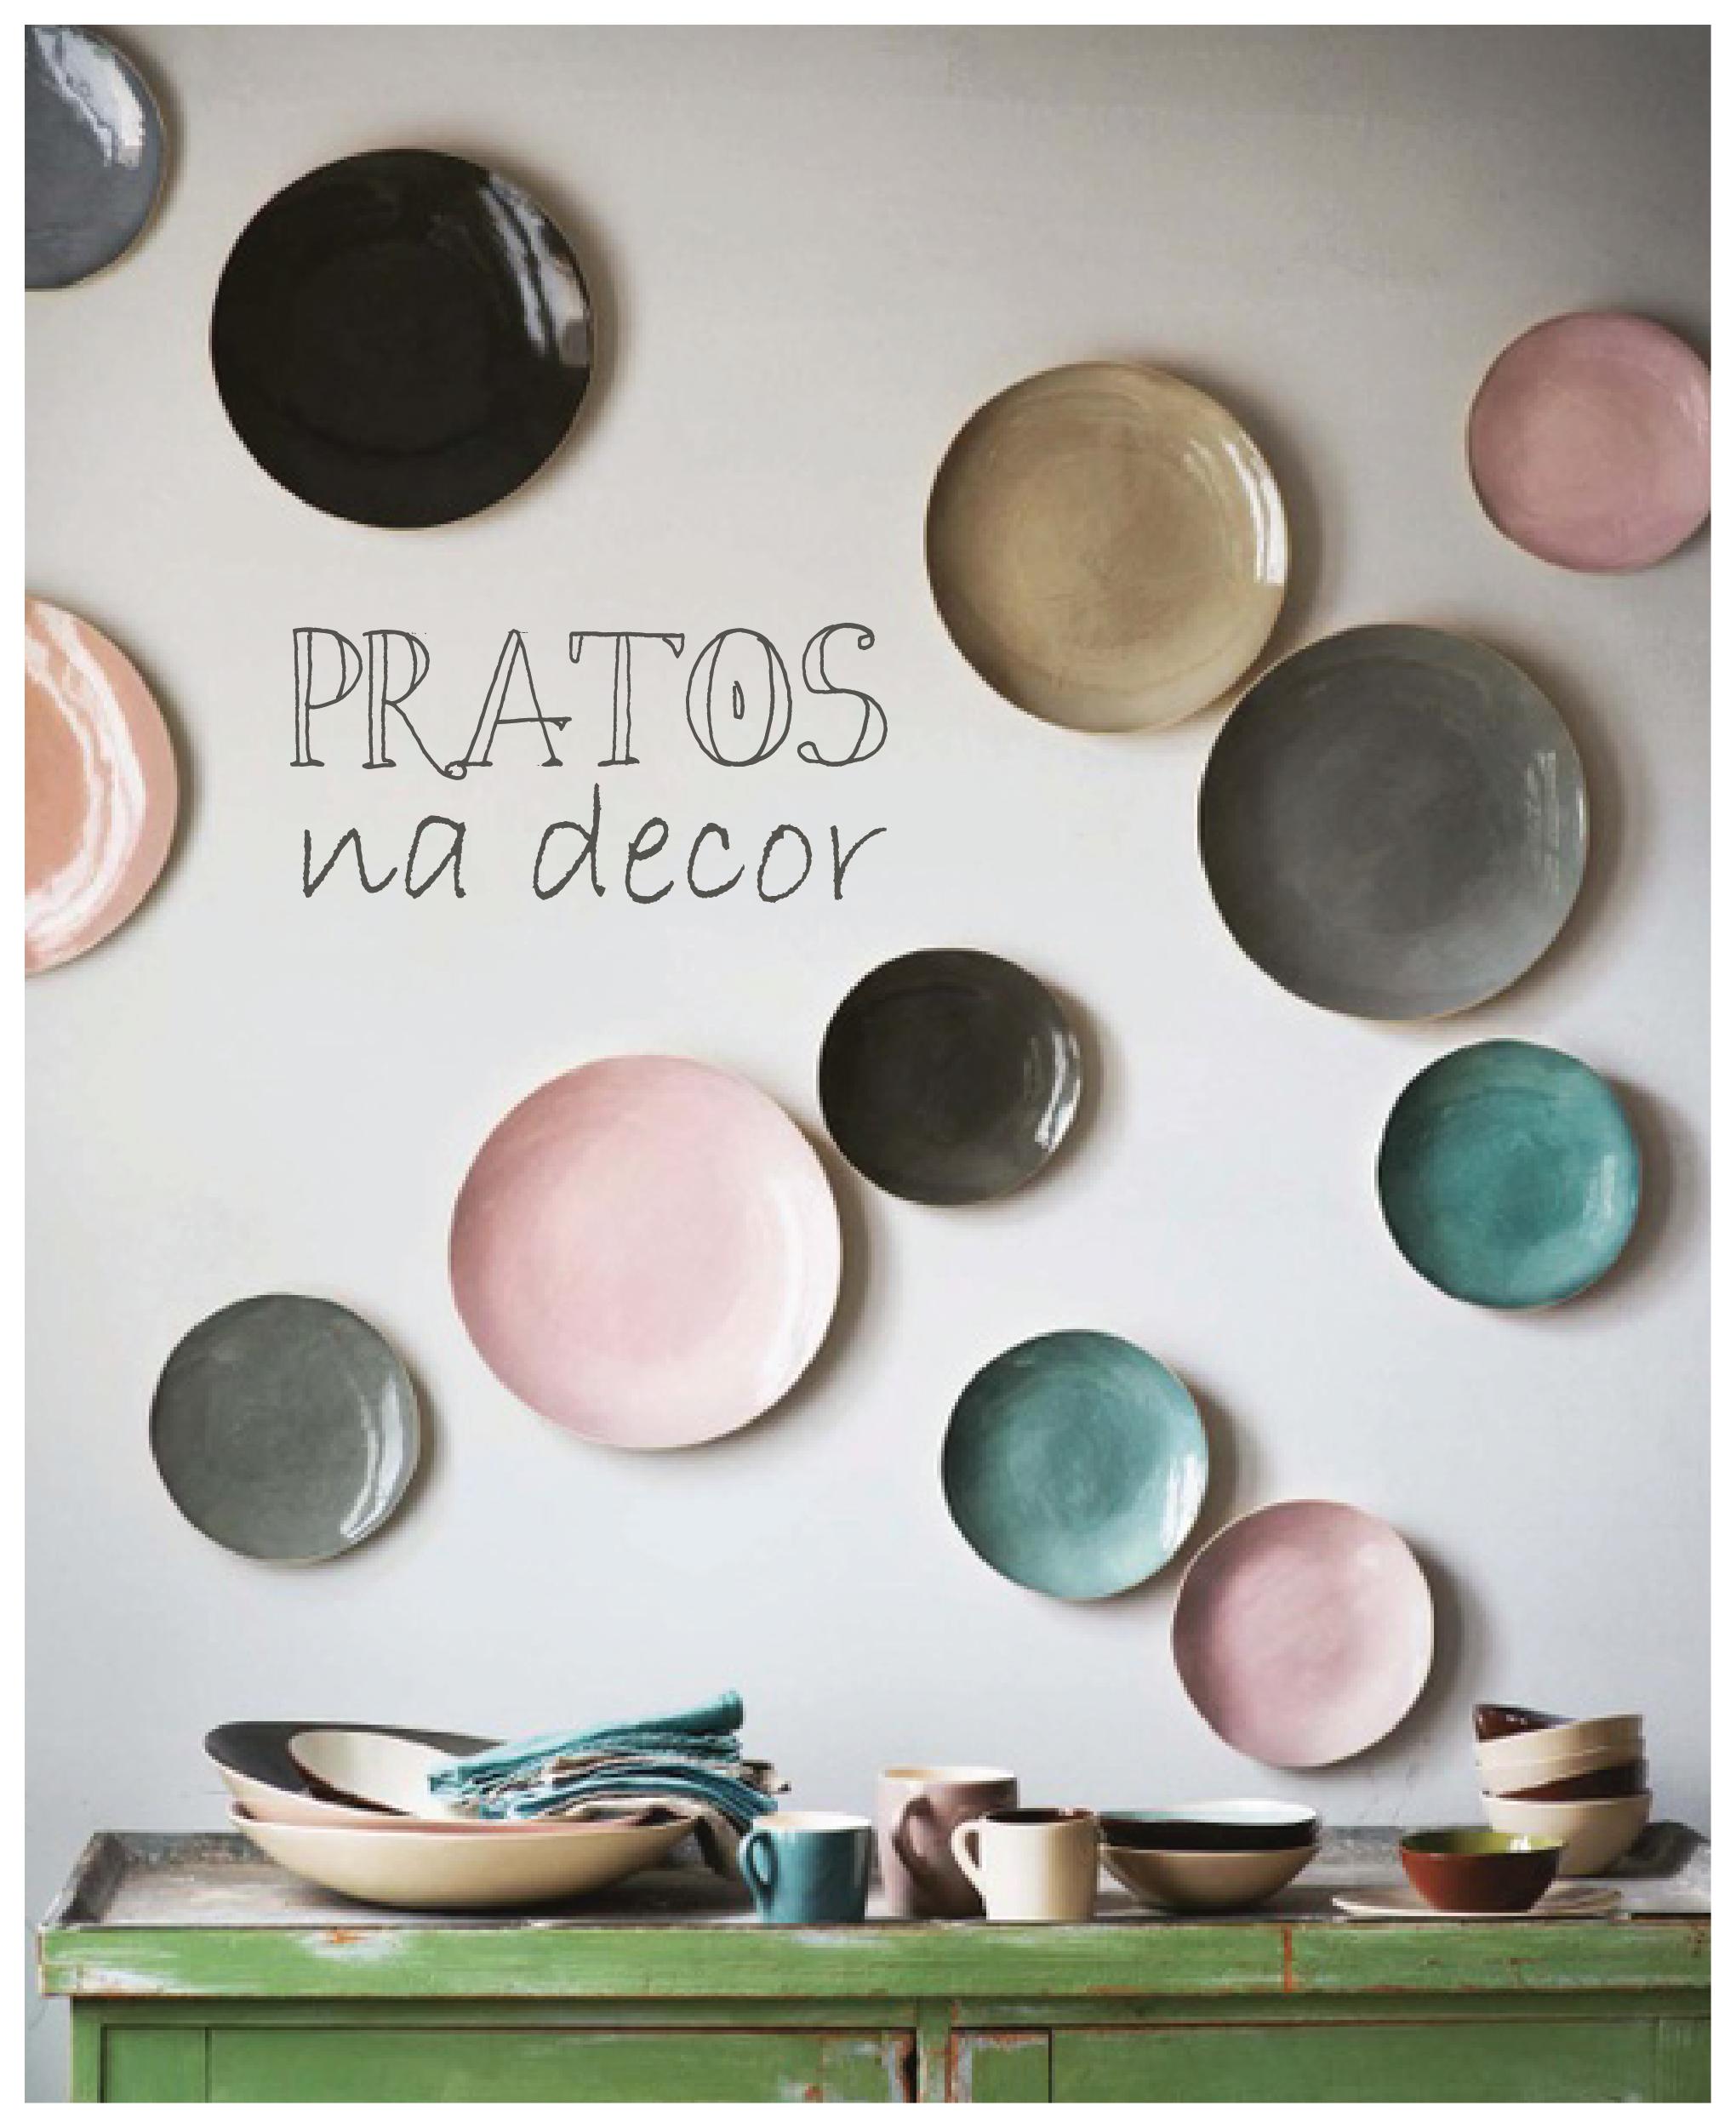 Pratos-01